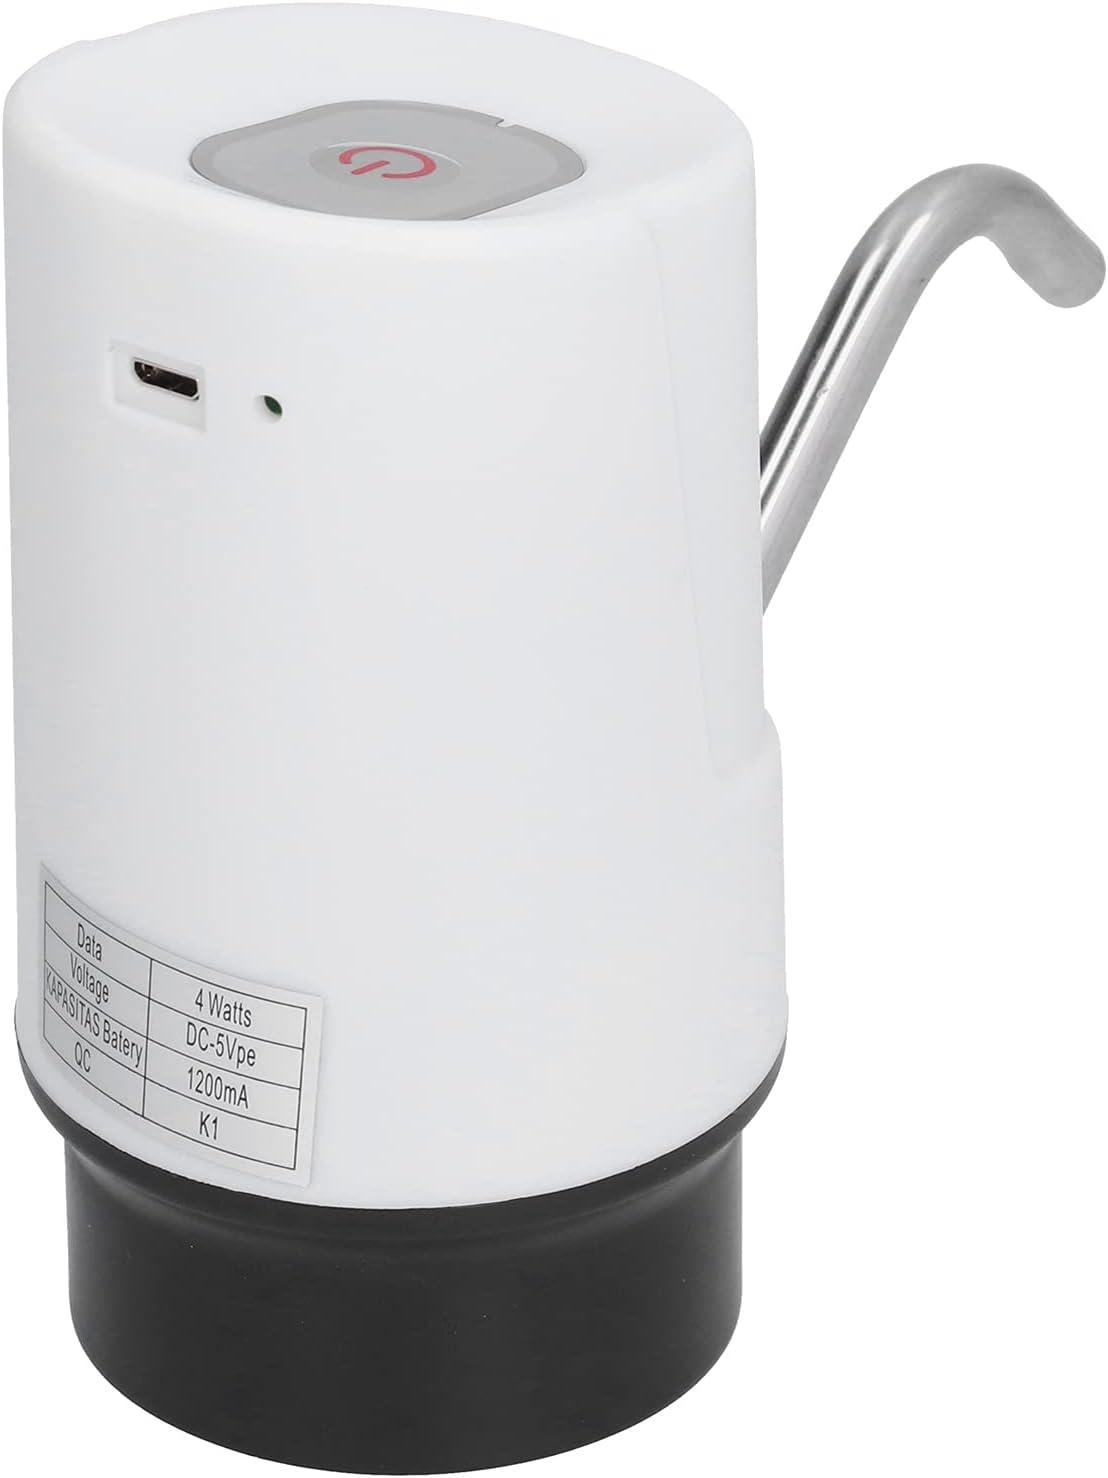 Water favorite Max 60% OFF Bottle Dispenser Electric Intelli Device Dispensing